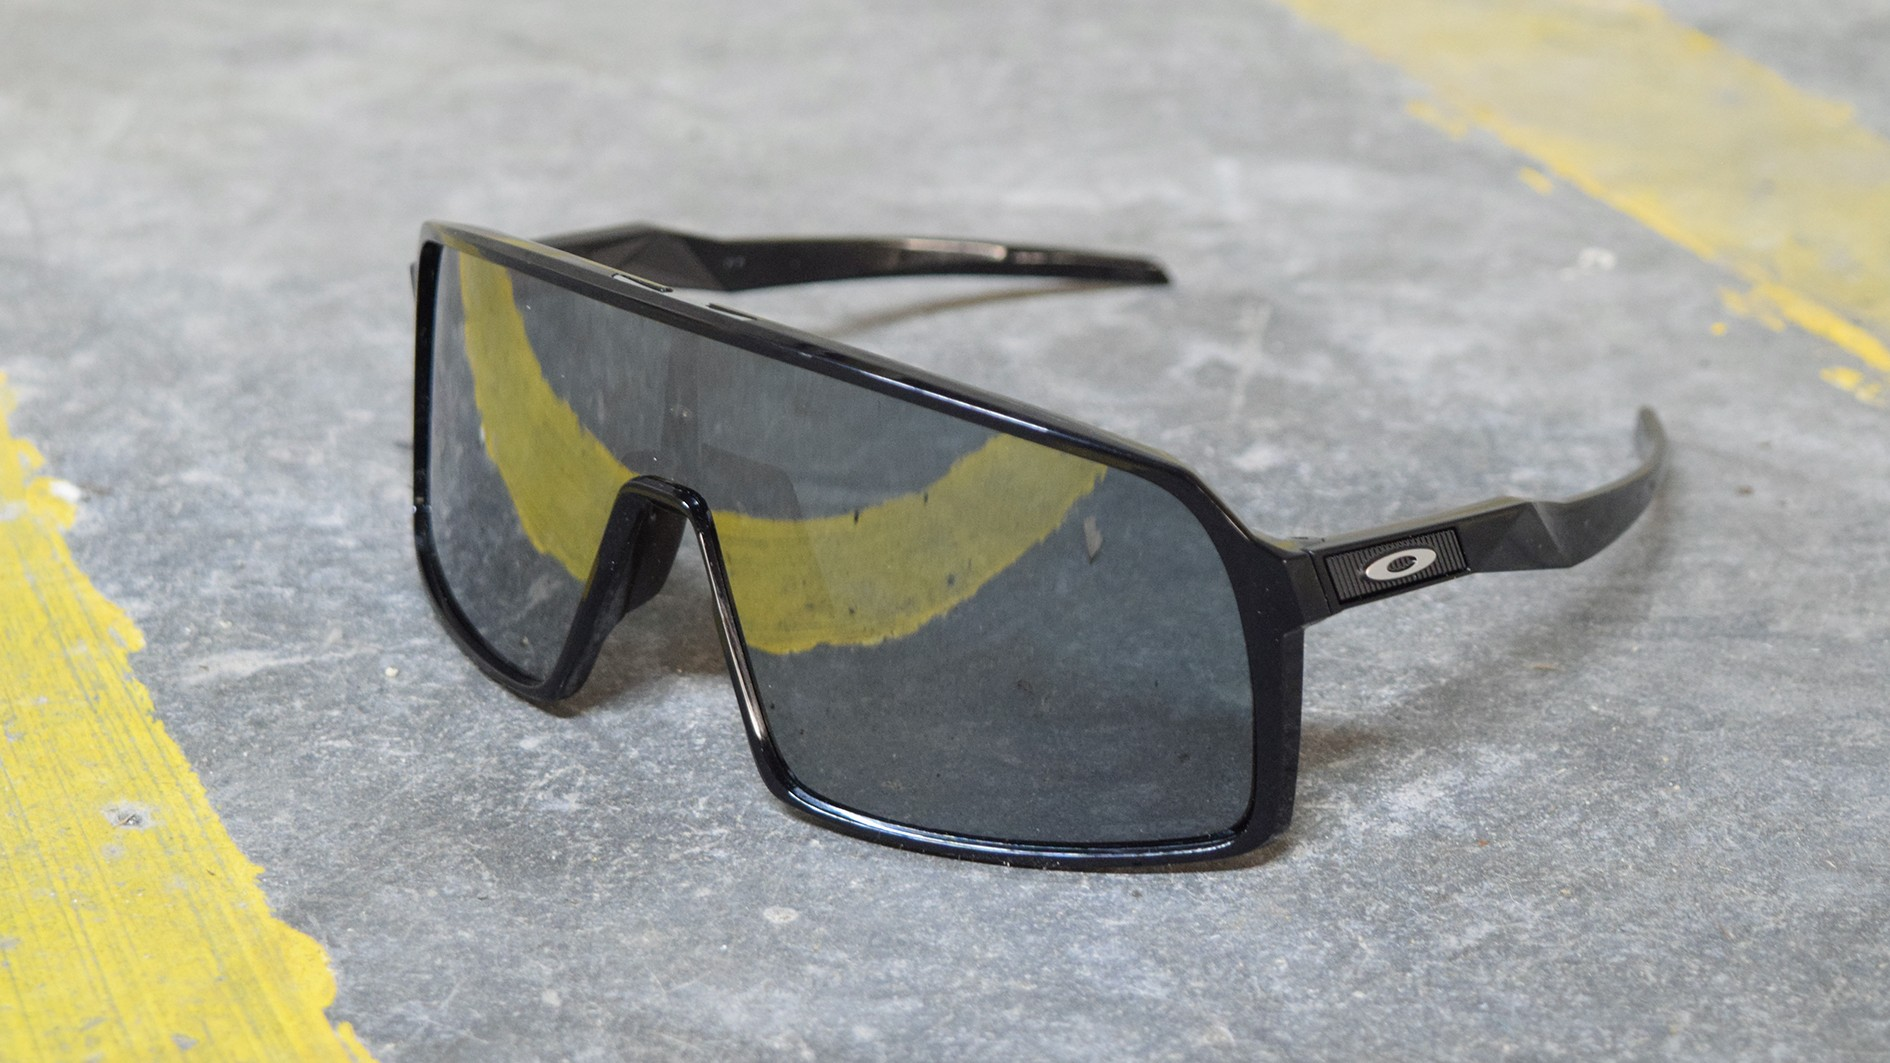 Oakley Sutro glasses